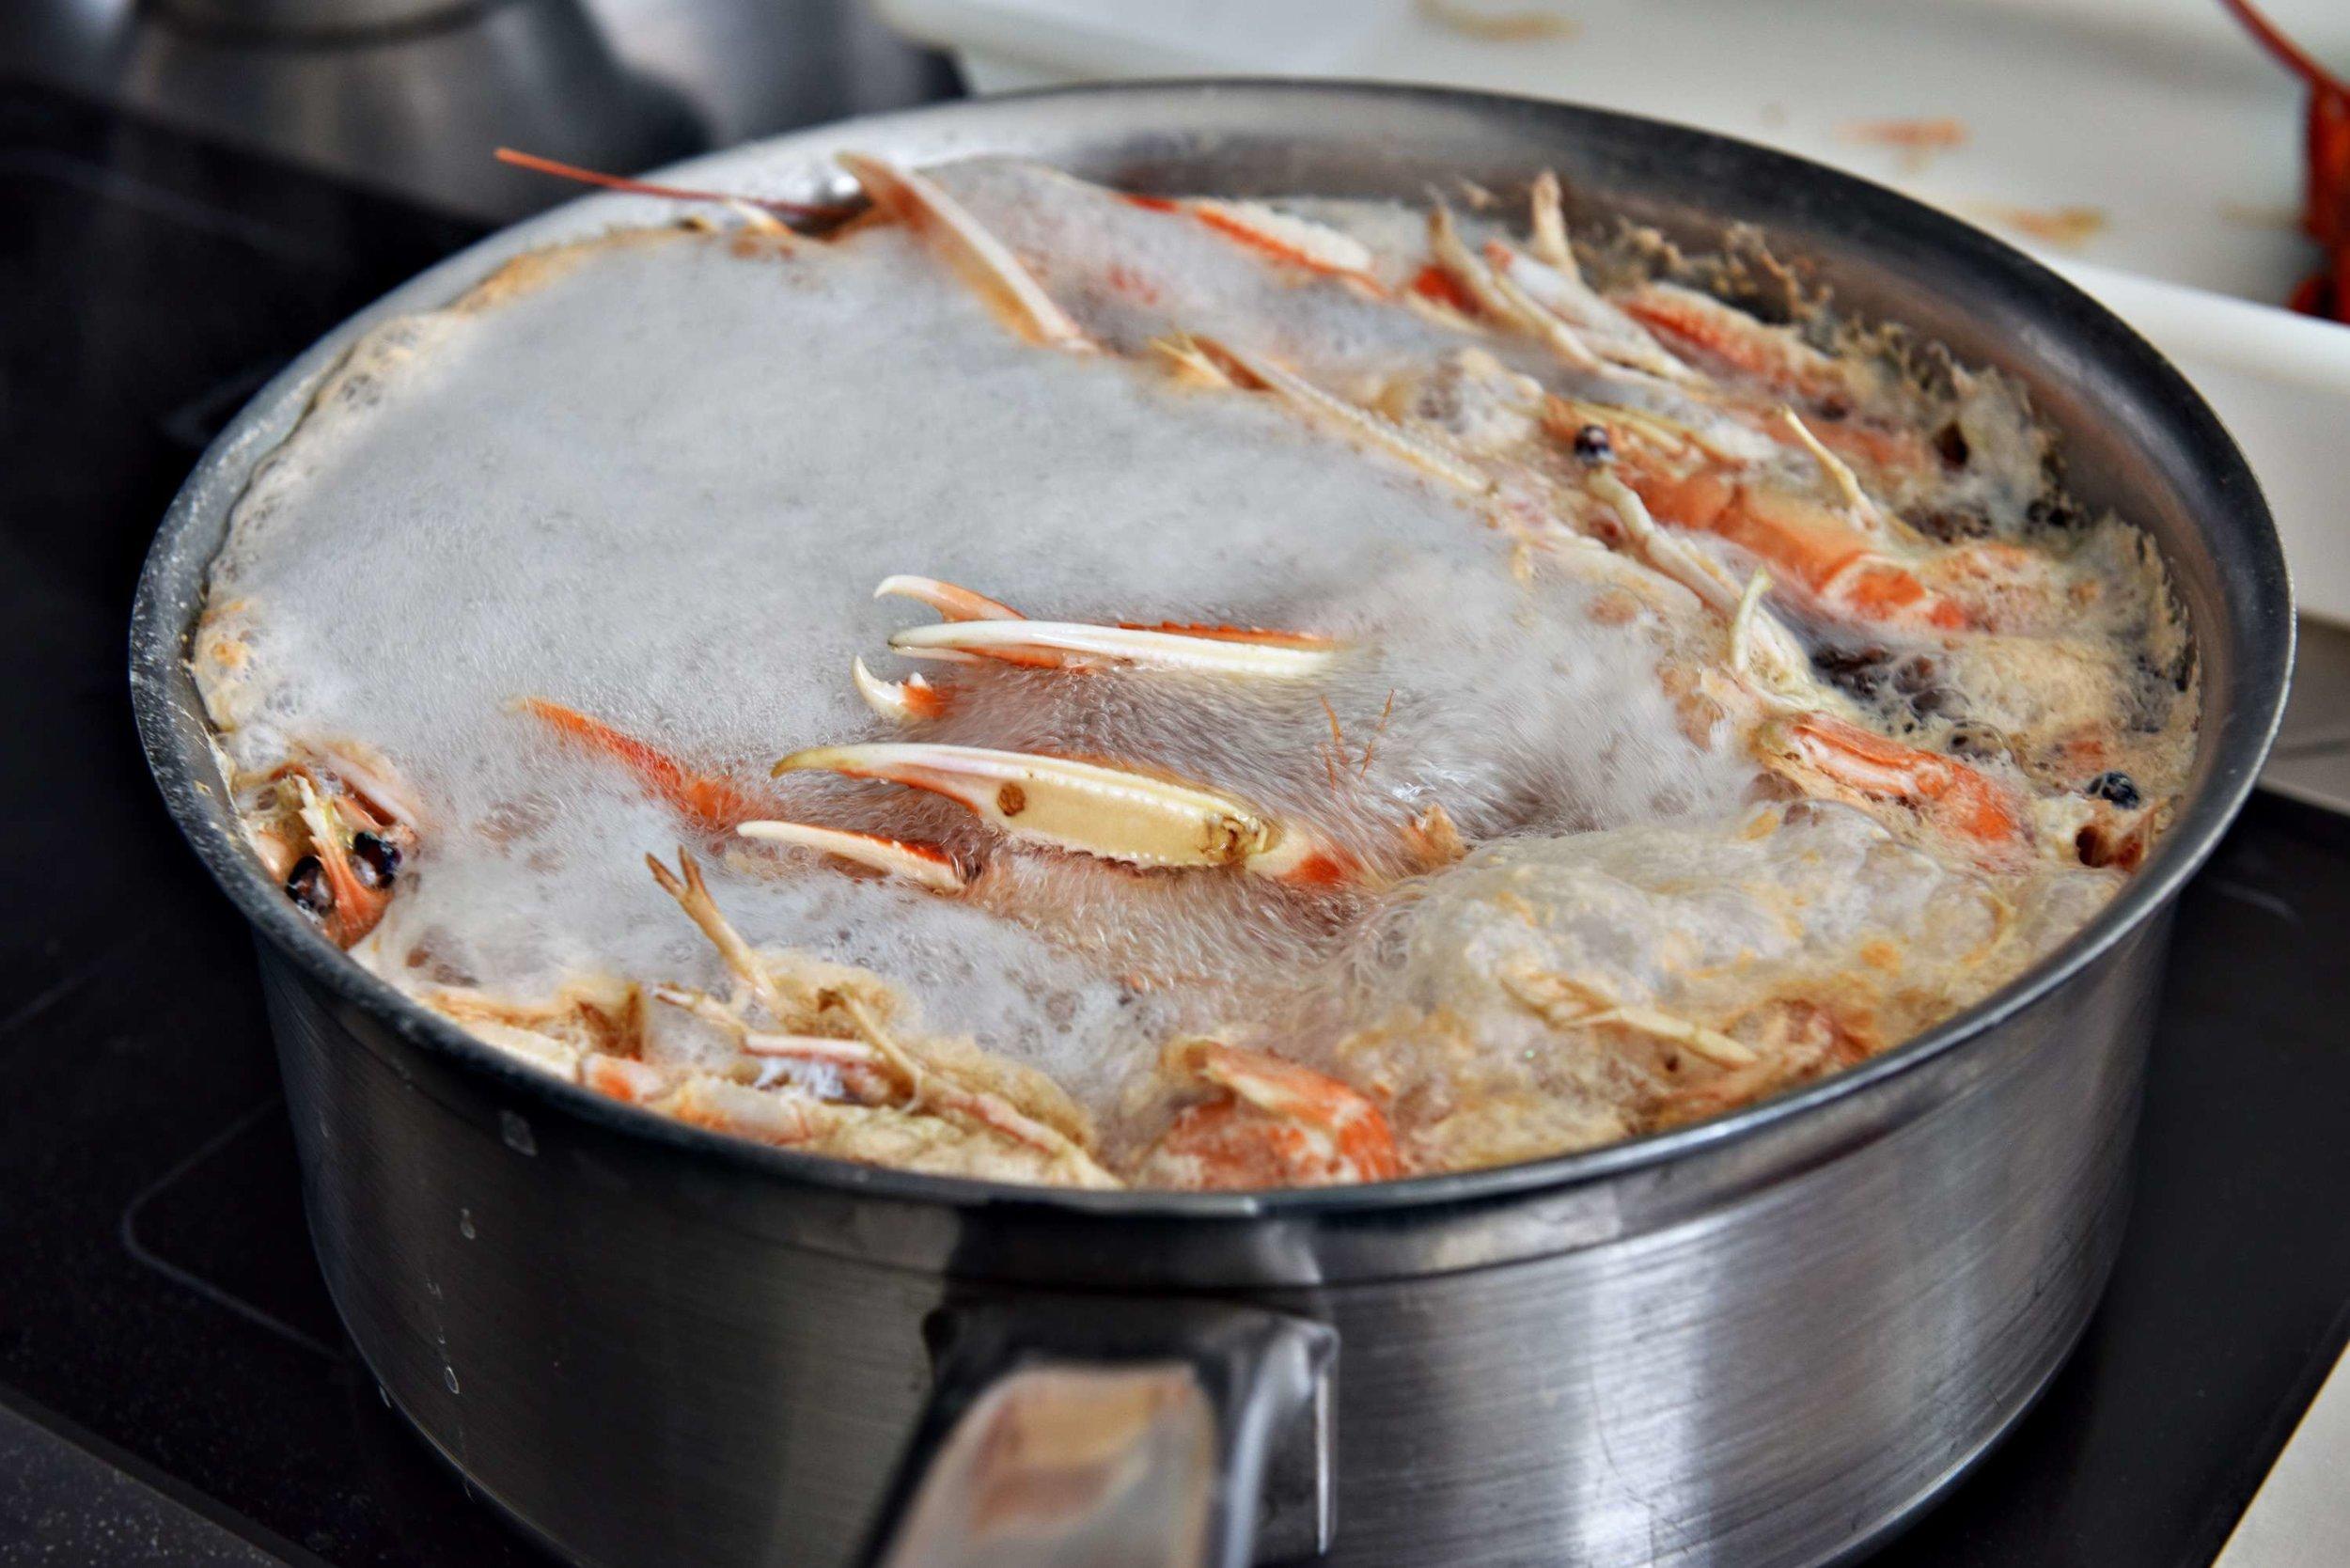 3 dome sur mer seafood schaal schelp kreeft restaurant bistro antwerpen frederic chabbert michelinstar bart albrecht tablefever.jpg